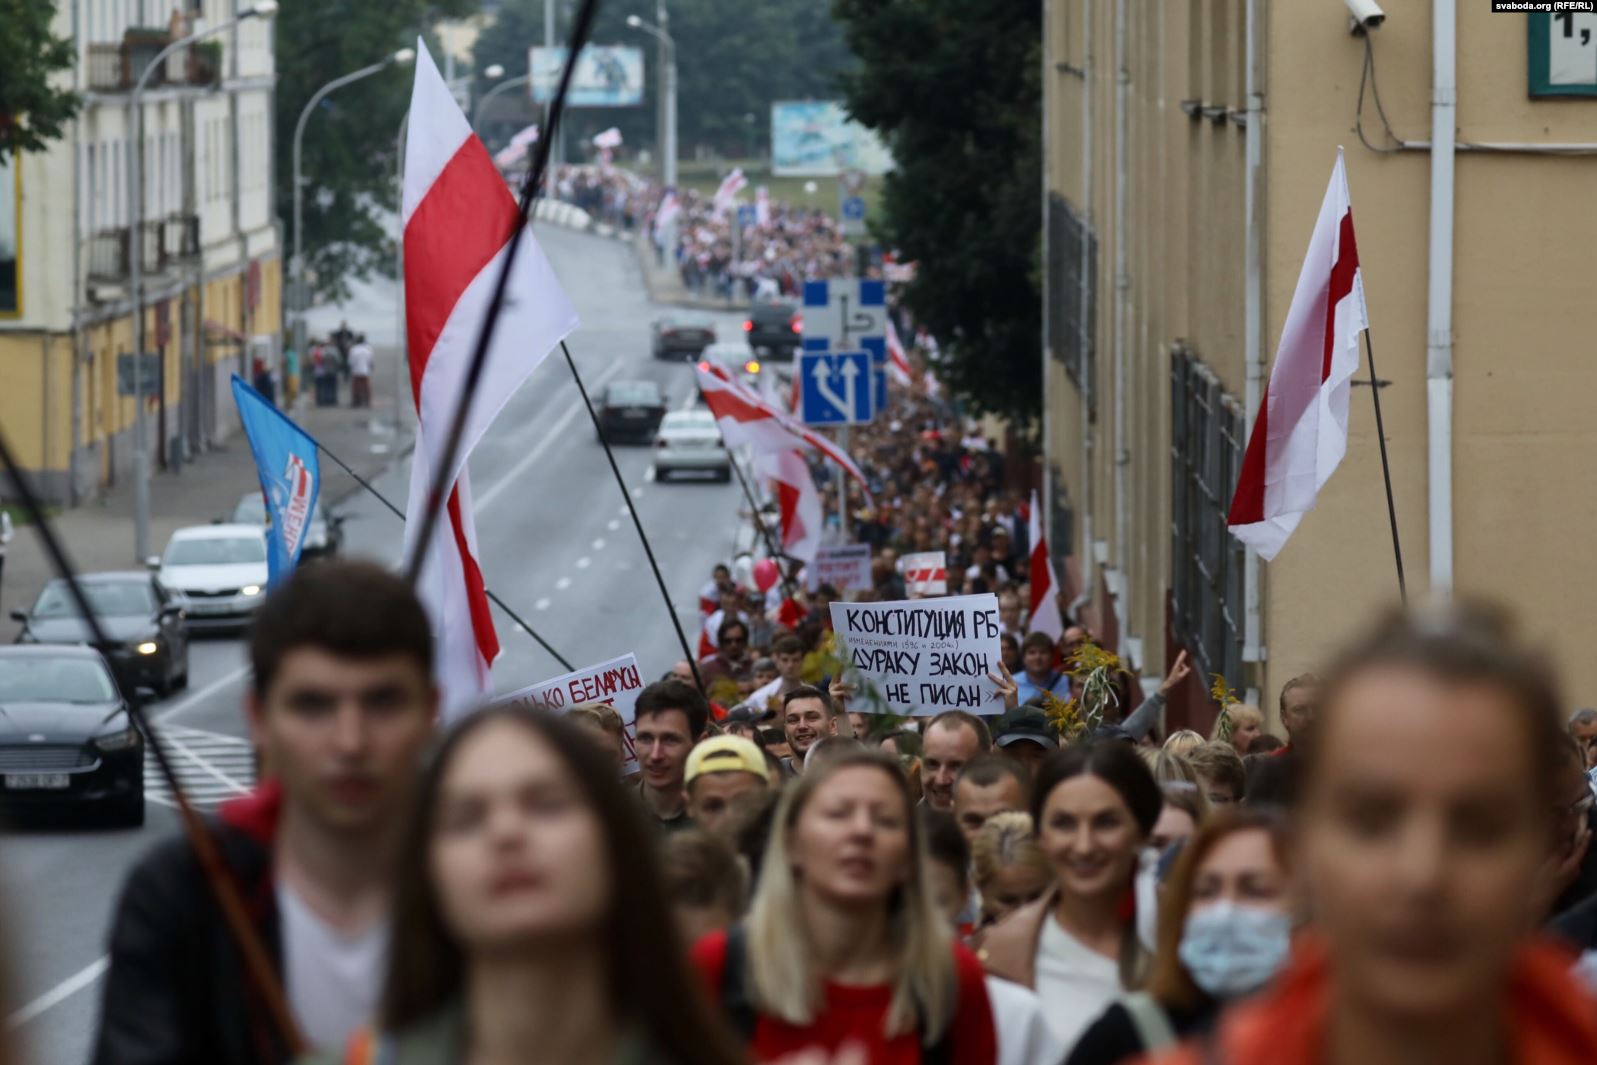 Колонна протестующих в Минске. Фото: Радыё Свабода